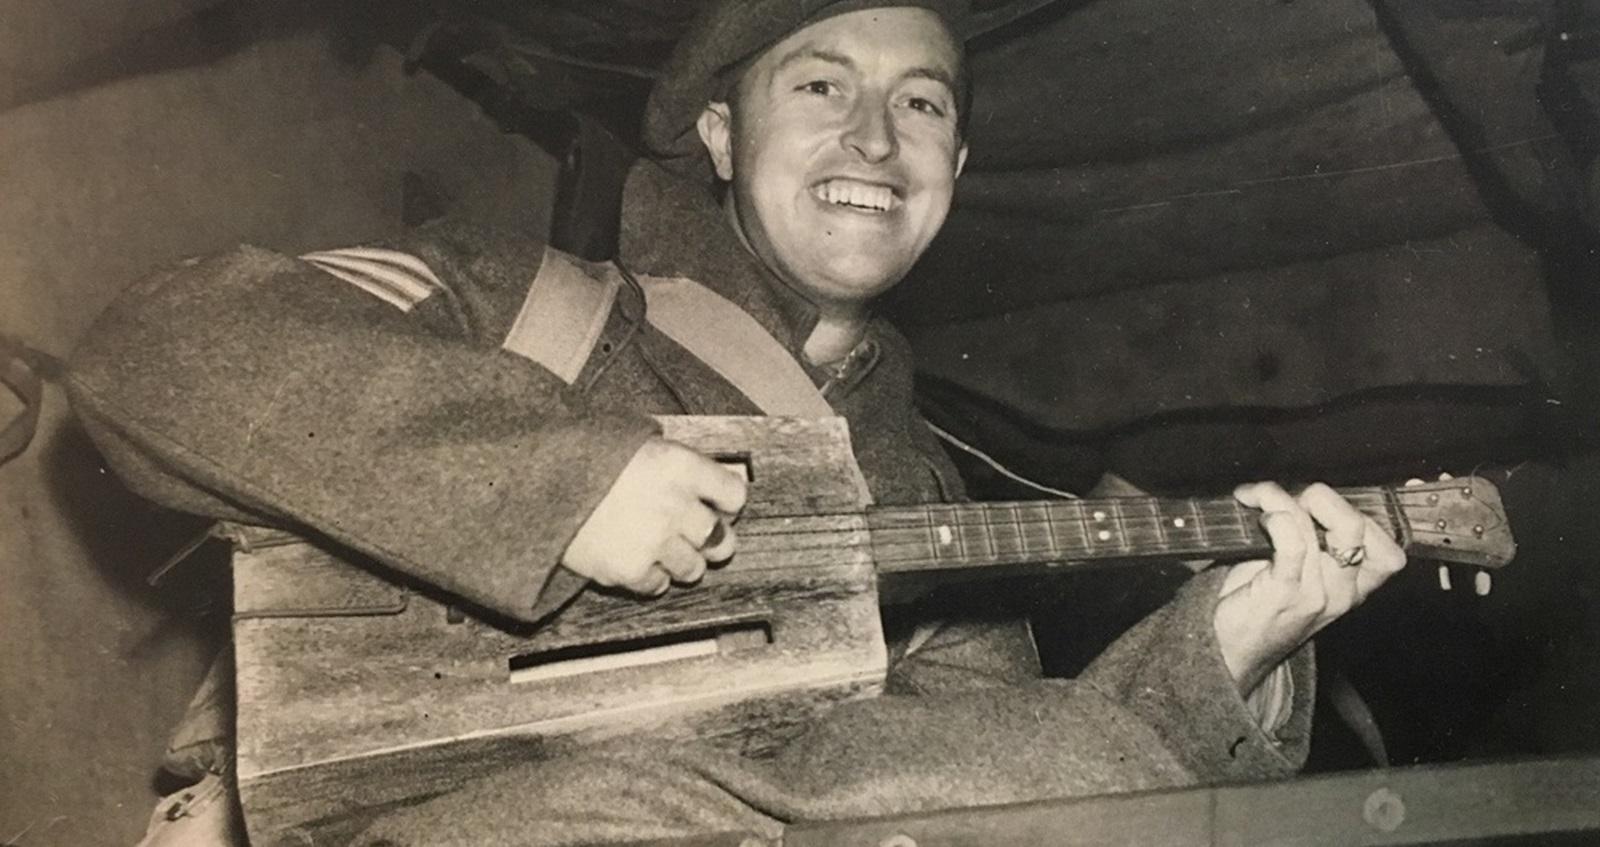 Tom Boardman on his return the UK after being held as a prisoner of war